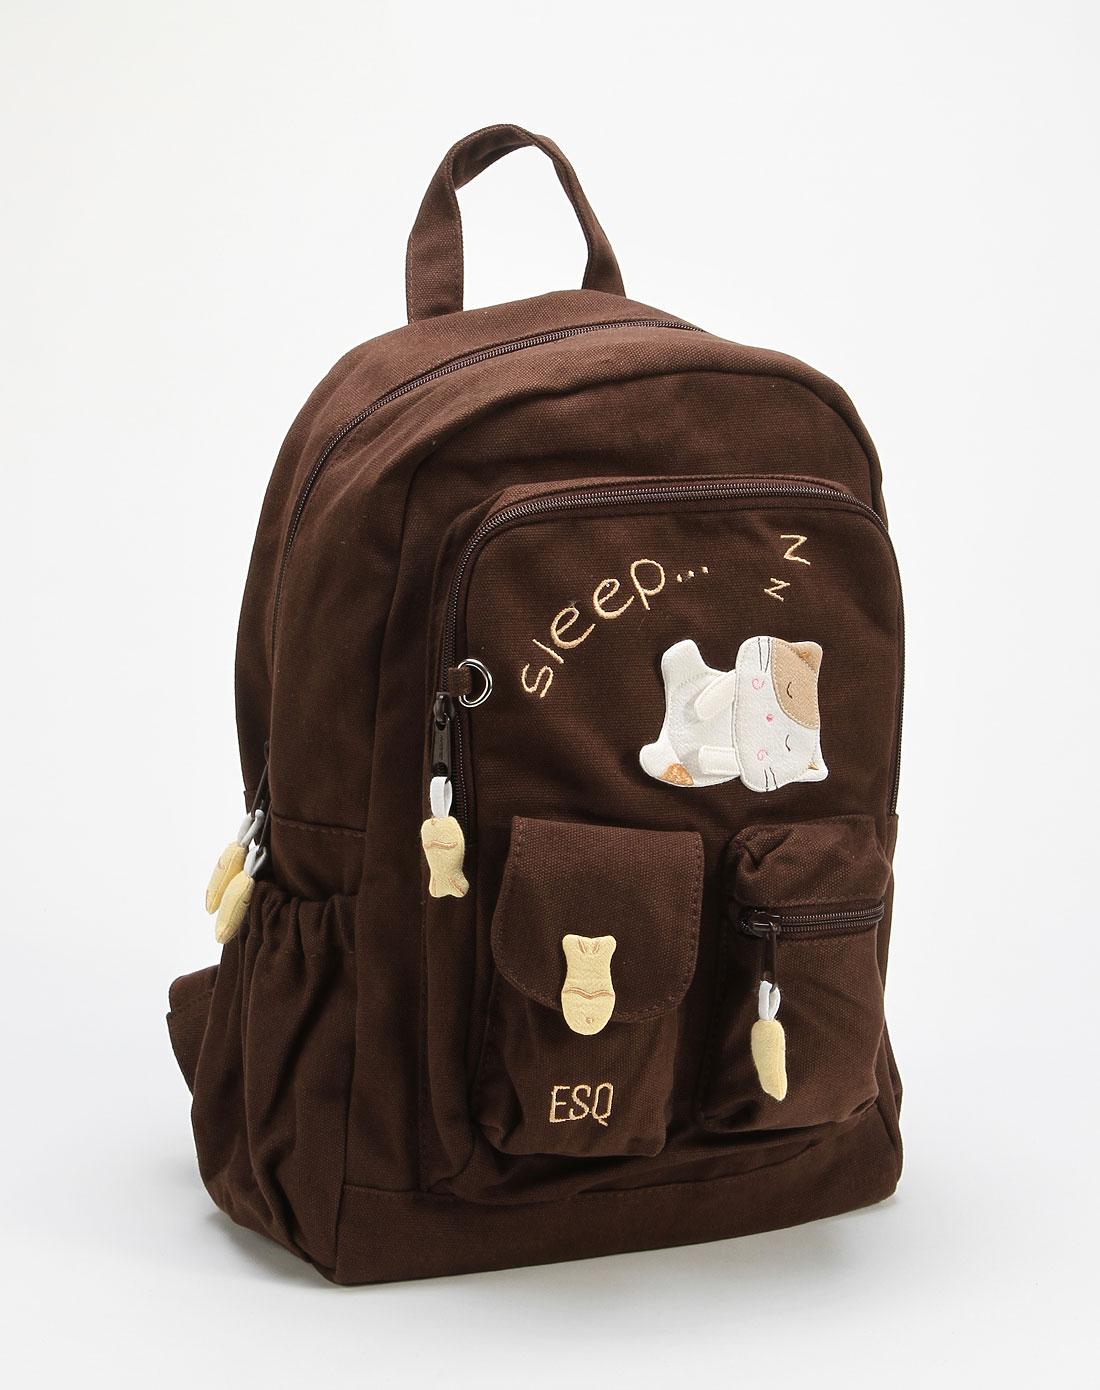 esq时尚可爱咖啡色双肩背包1002815